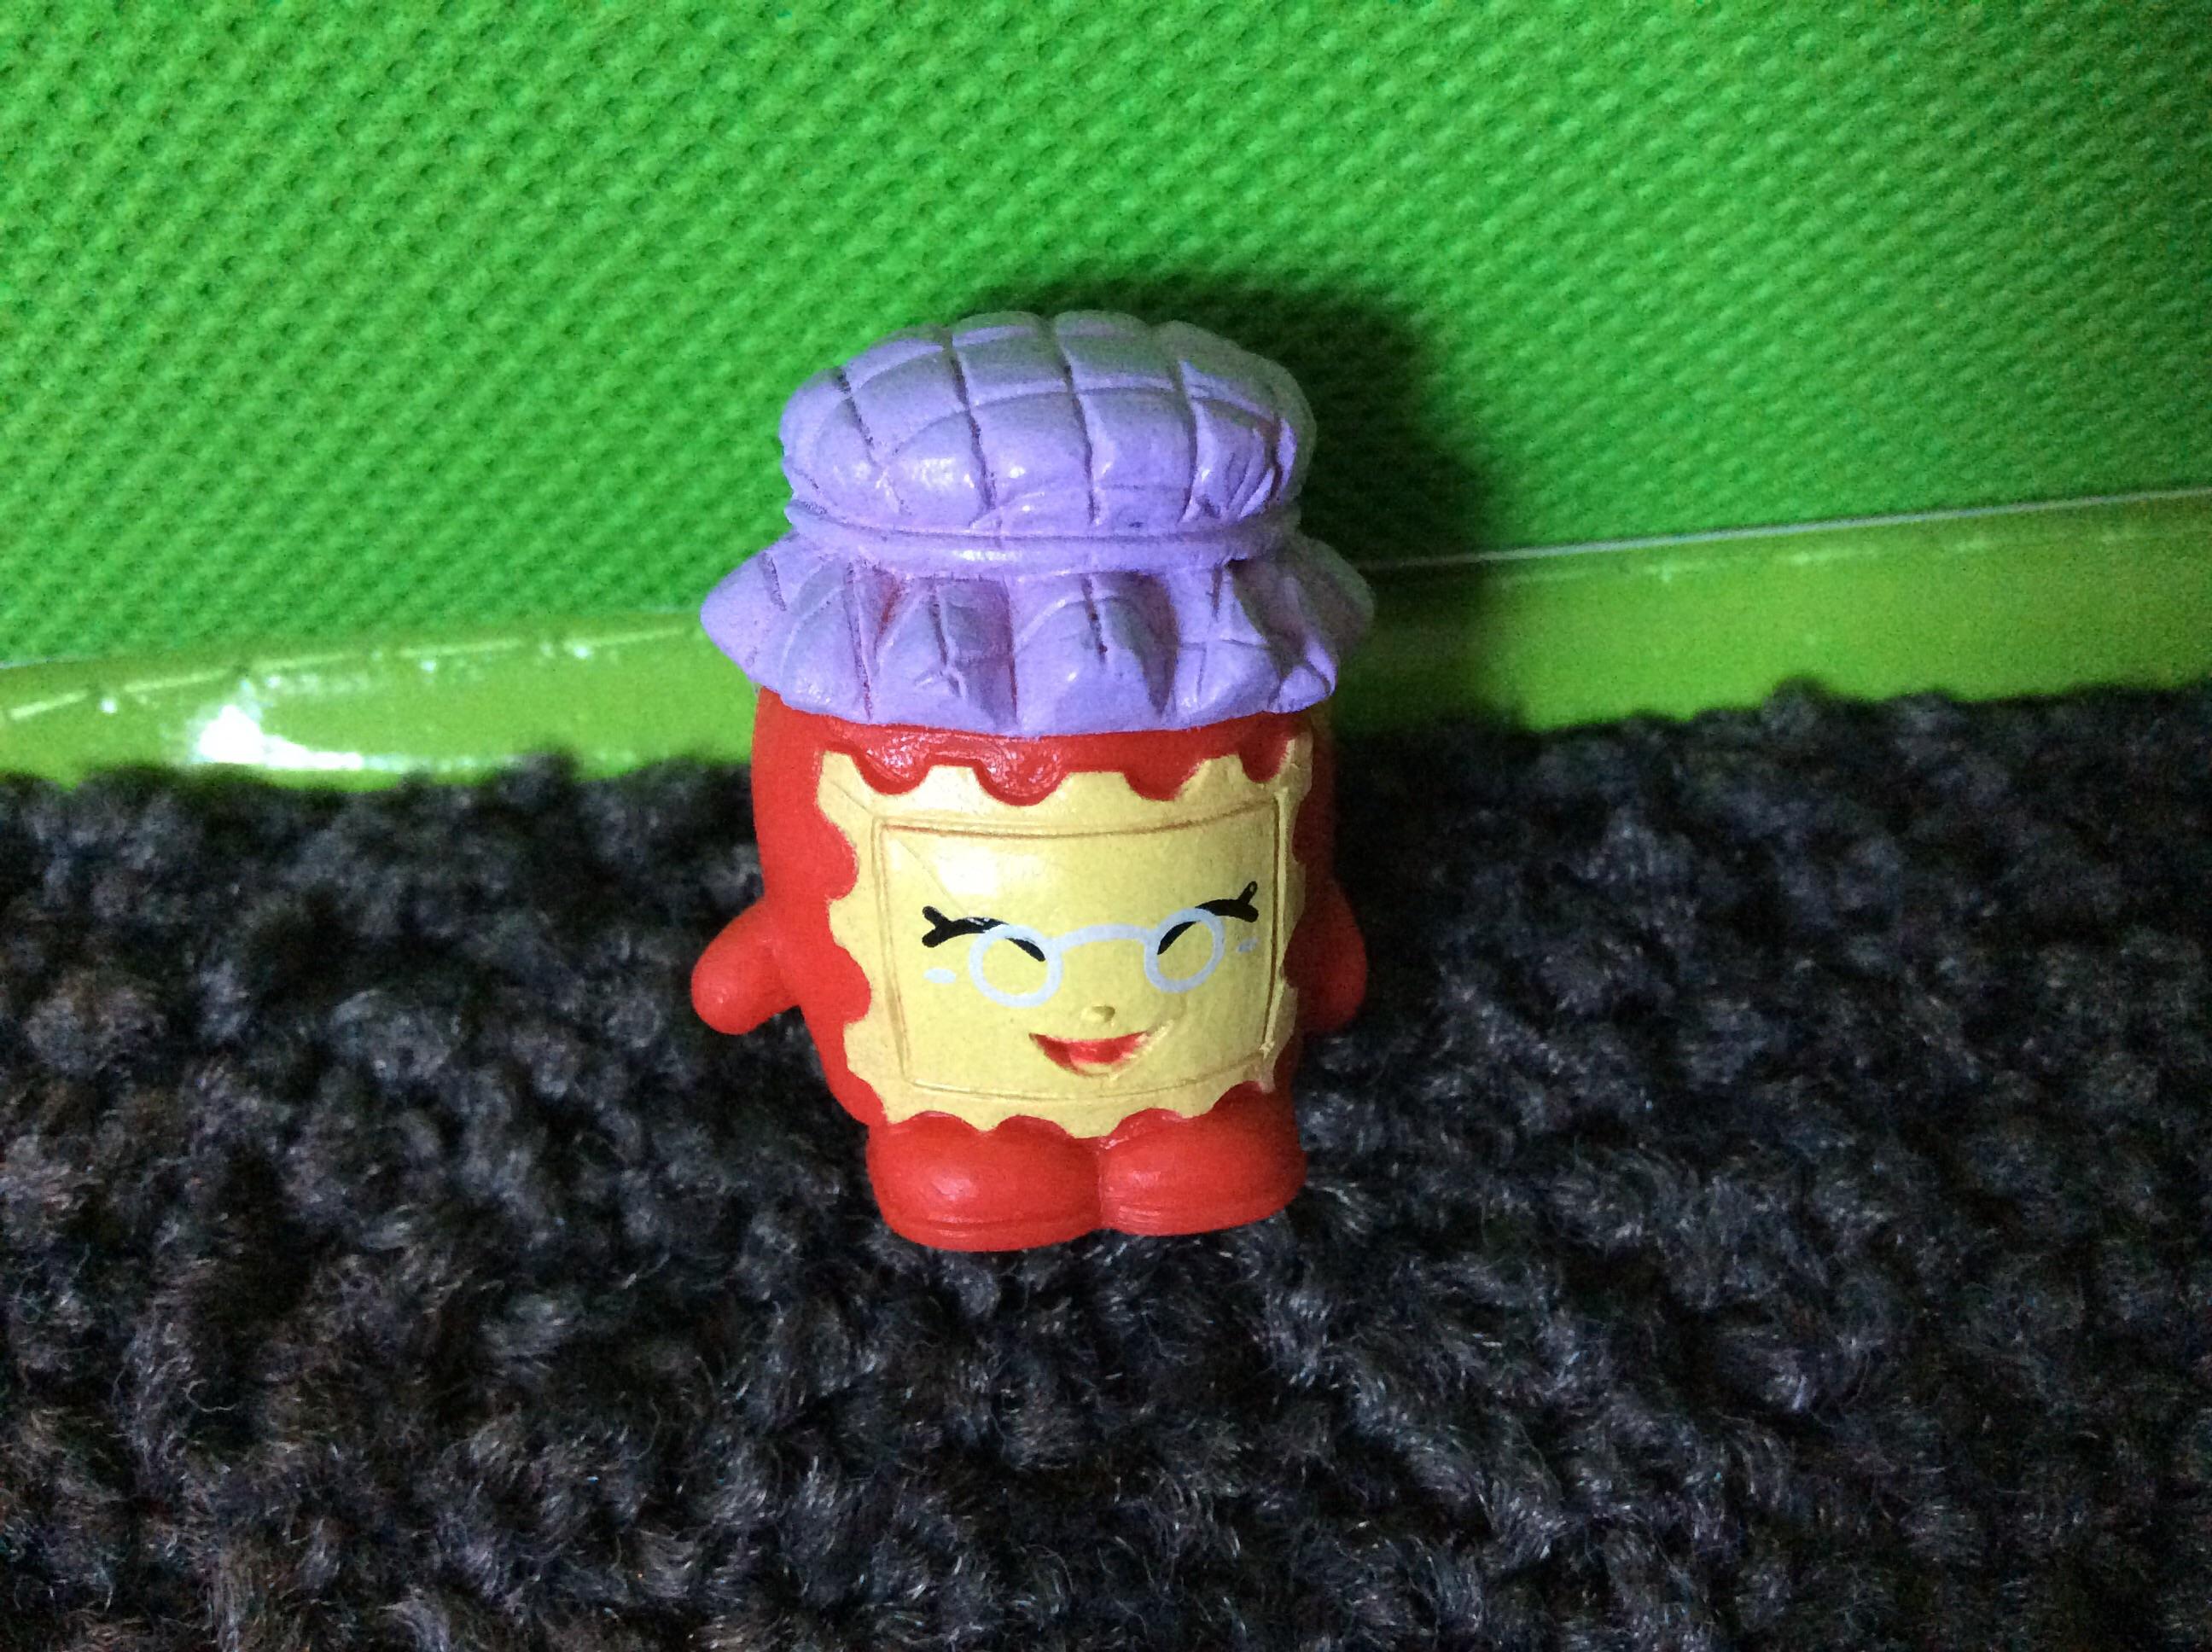 Файл:Gran jam toy.jpg